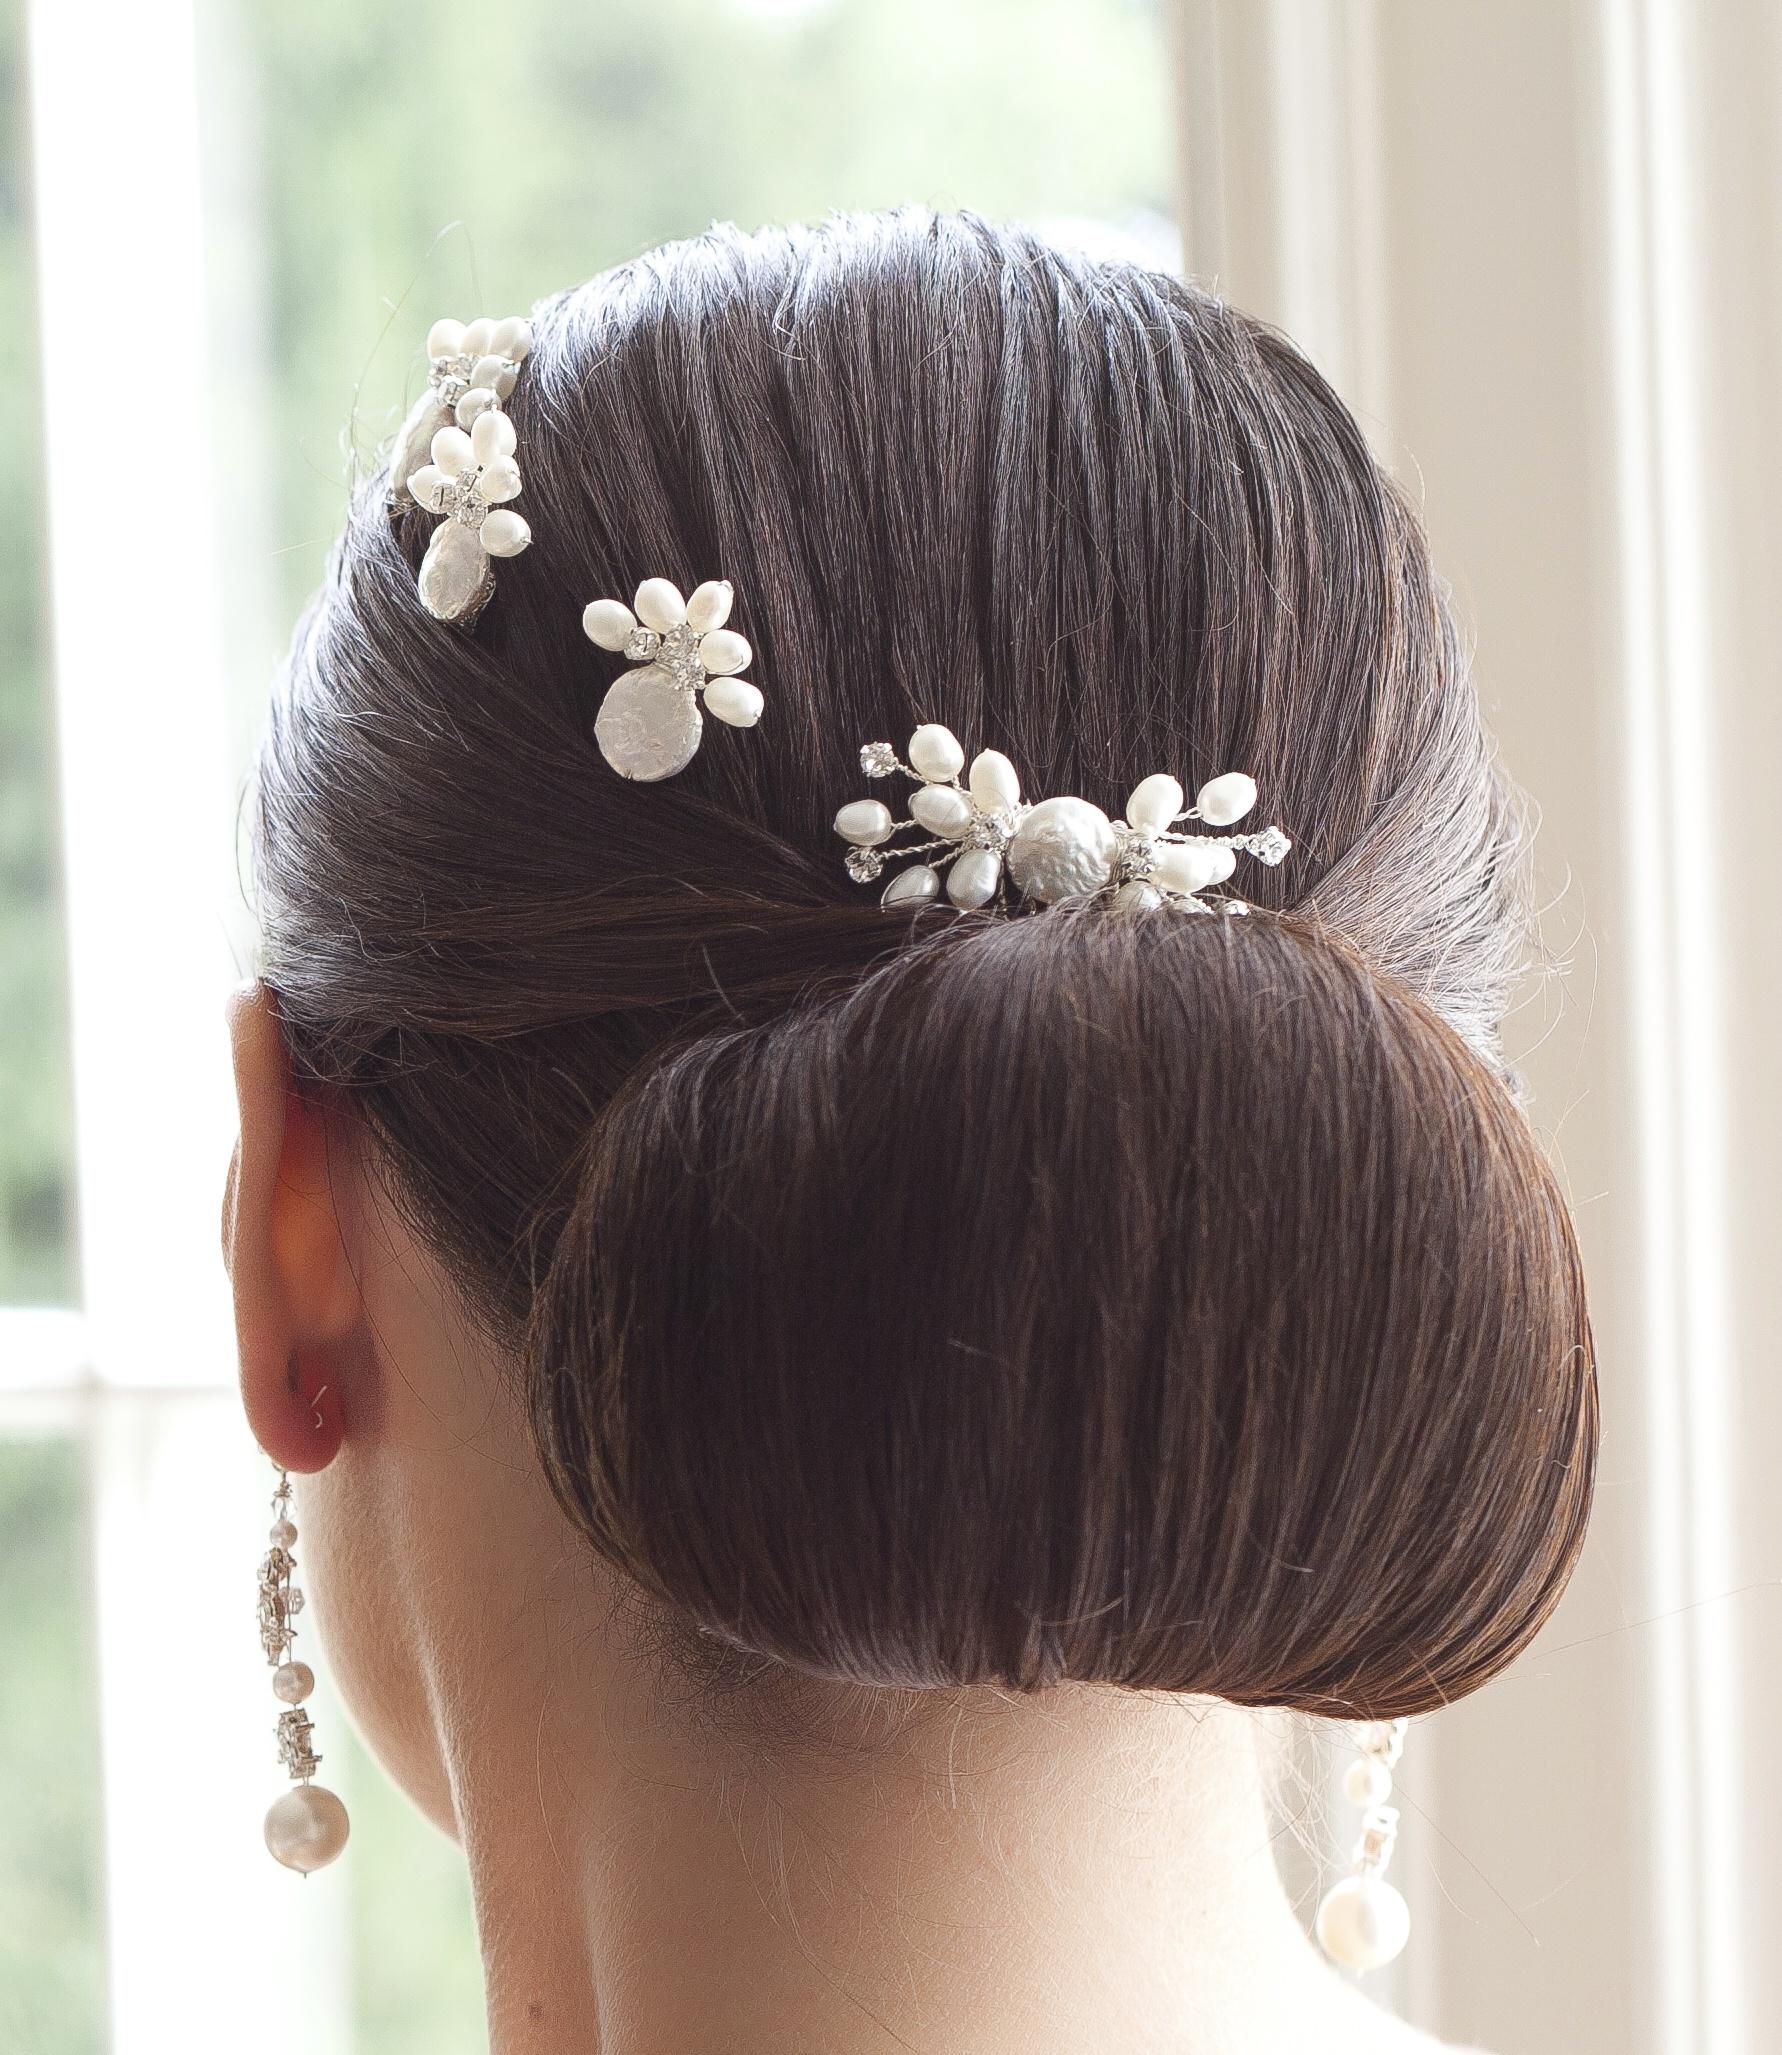 bridal hair pins bridal hairpins, bridal hair accessories, bridal hair accessory, bridal headpiece